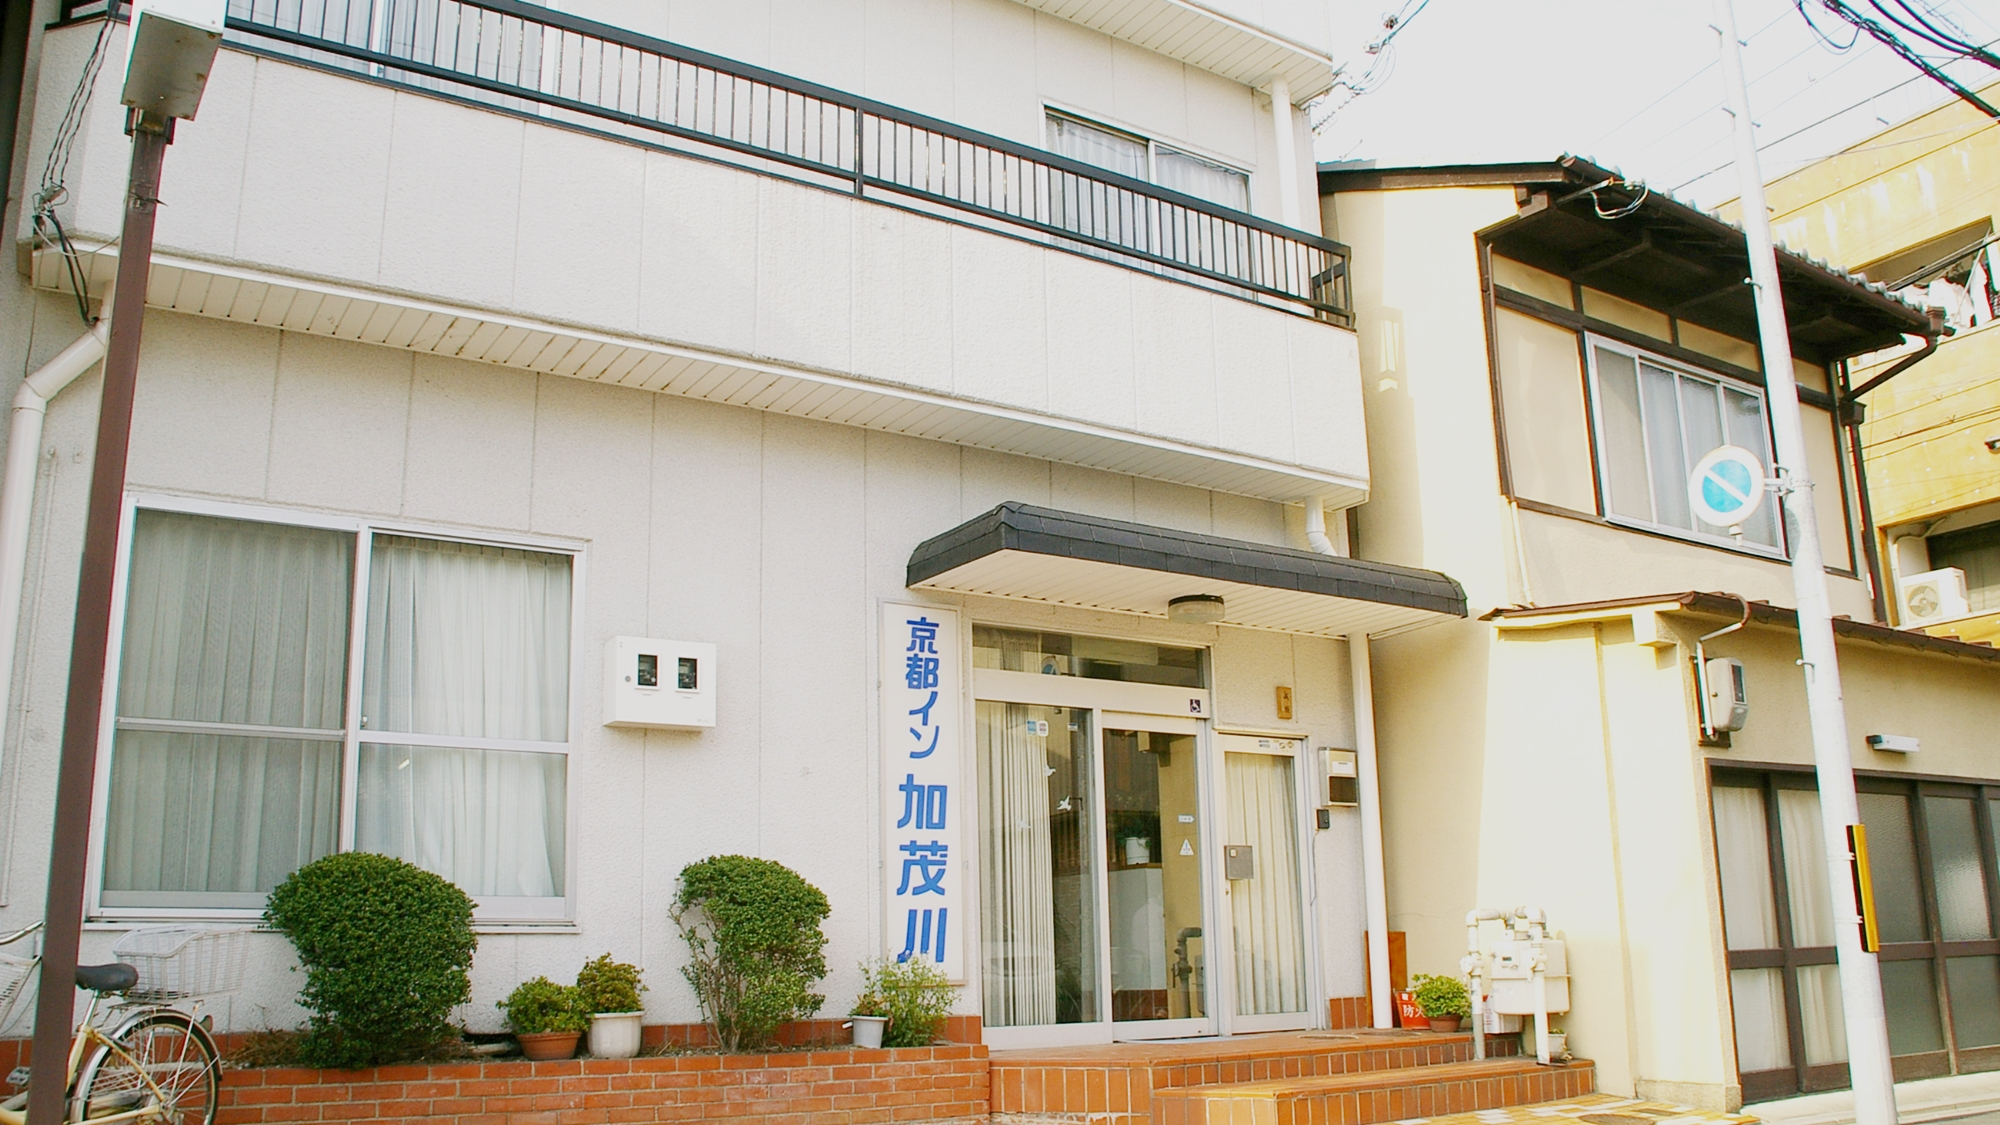 京都イン加茂川